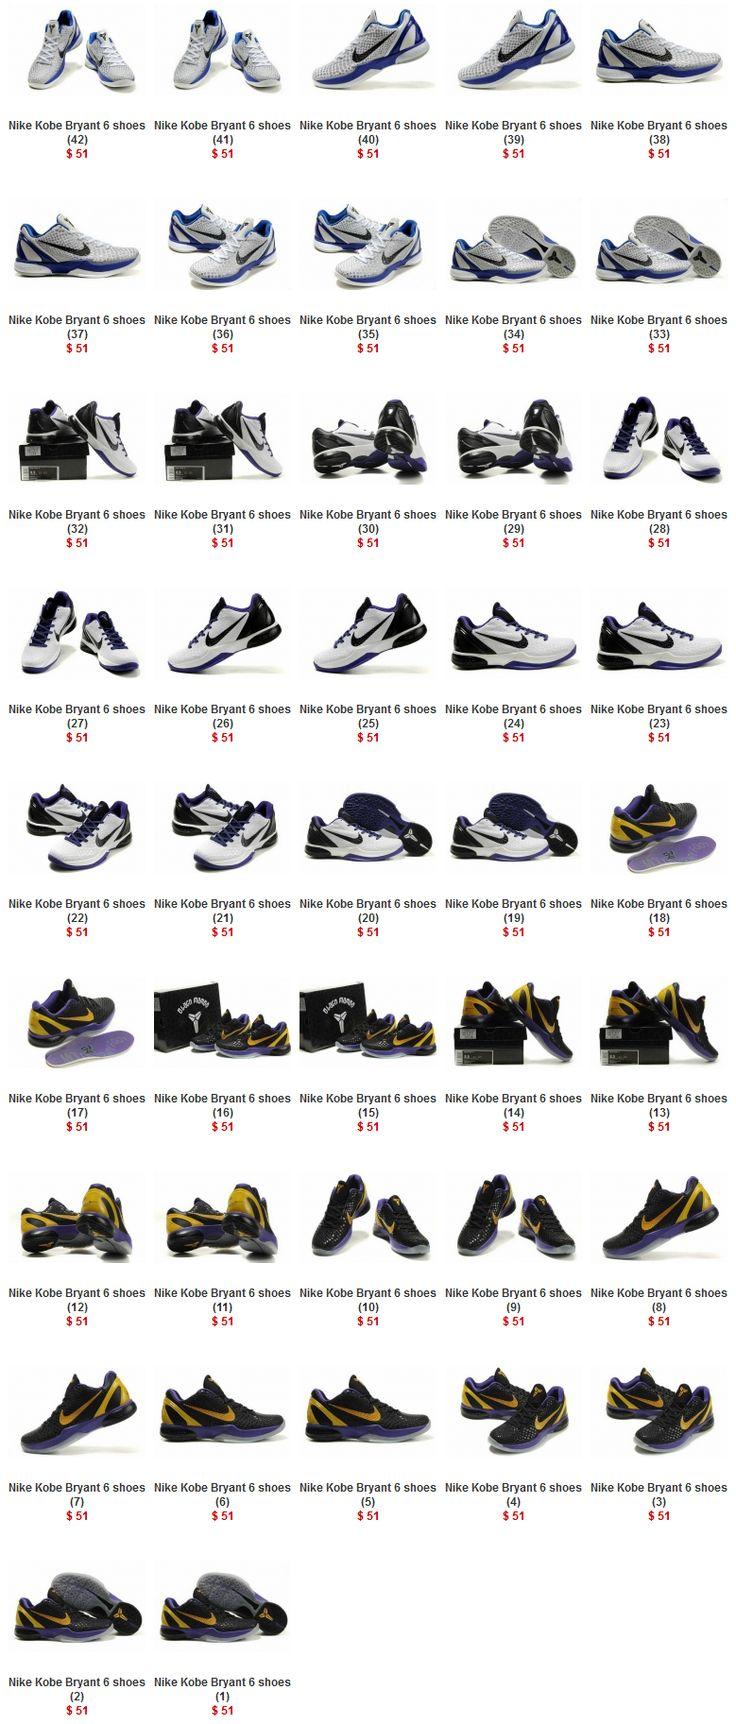 innovative design 338f6 ba56e ... Nike Kobe Bryant 6 shoes page 5 ...